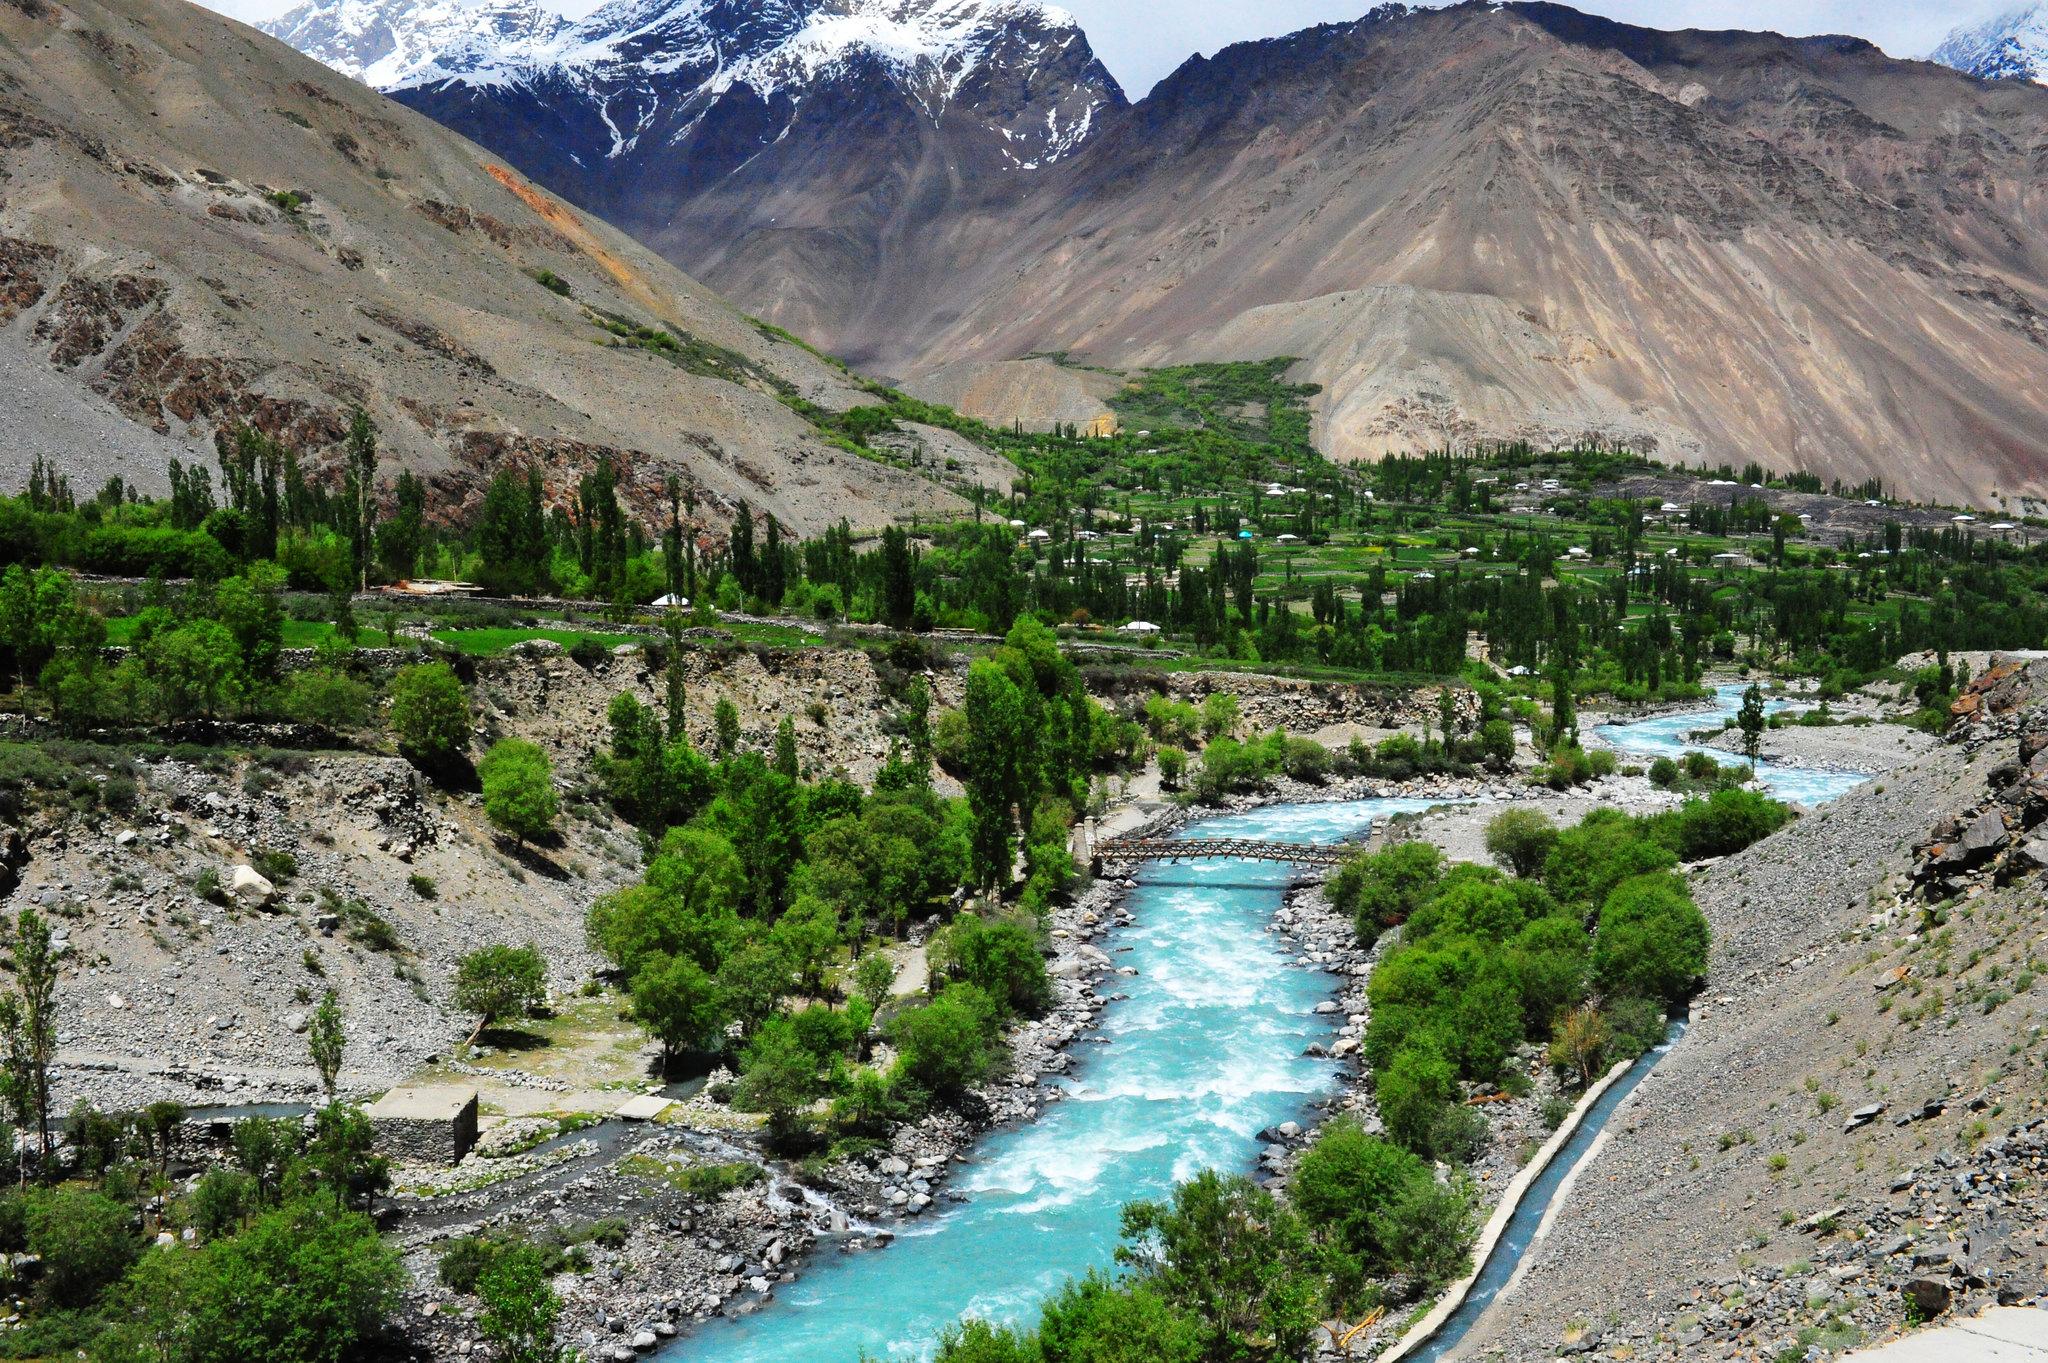 Ghizar River, Khyber-Pakhtoonkhwa, Pakistan [2048x1363]